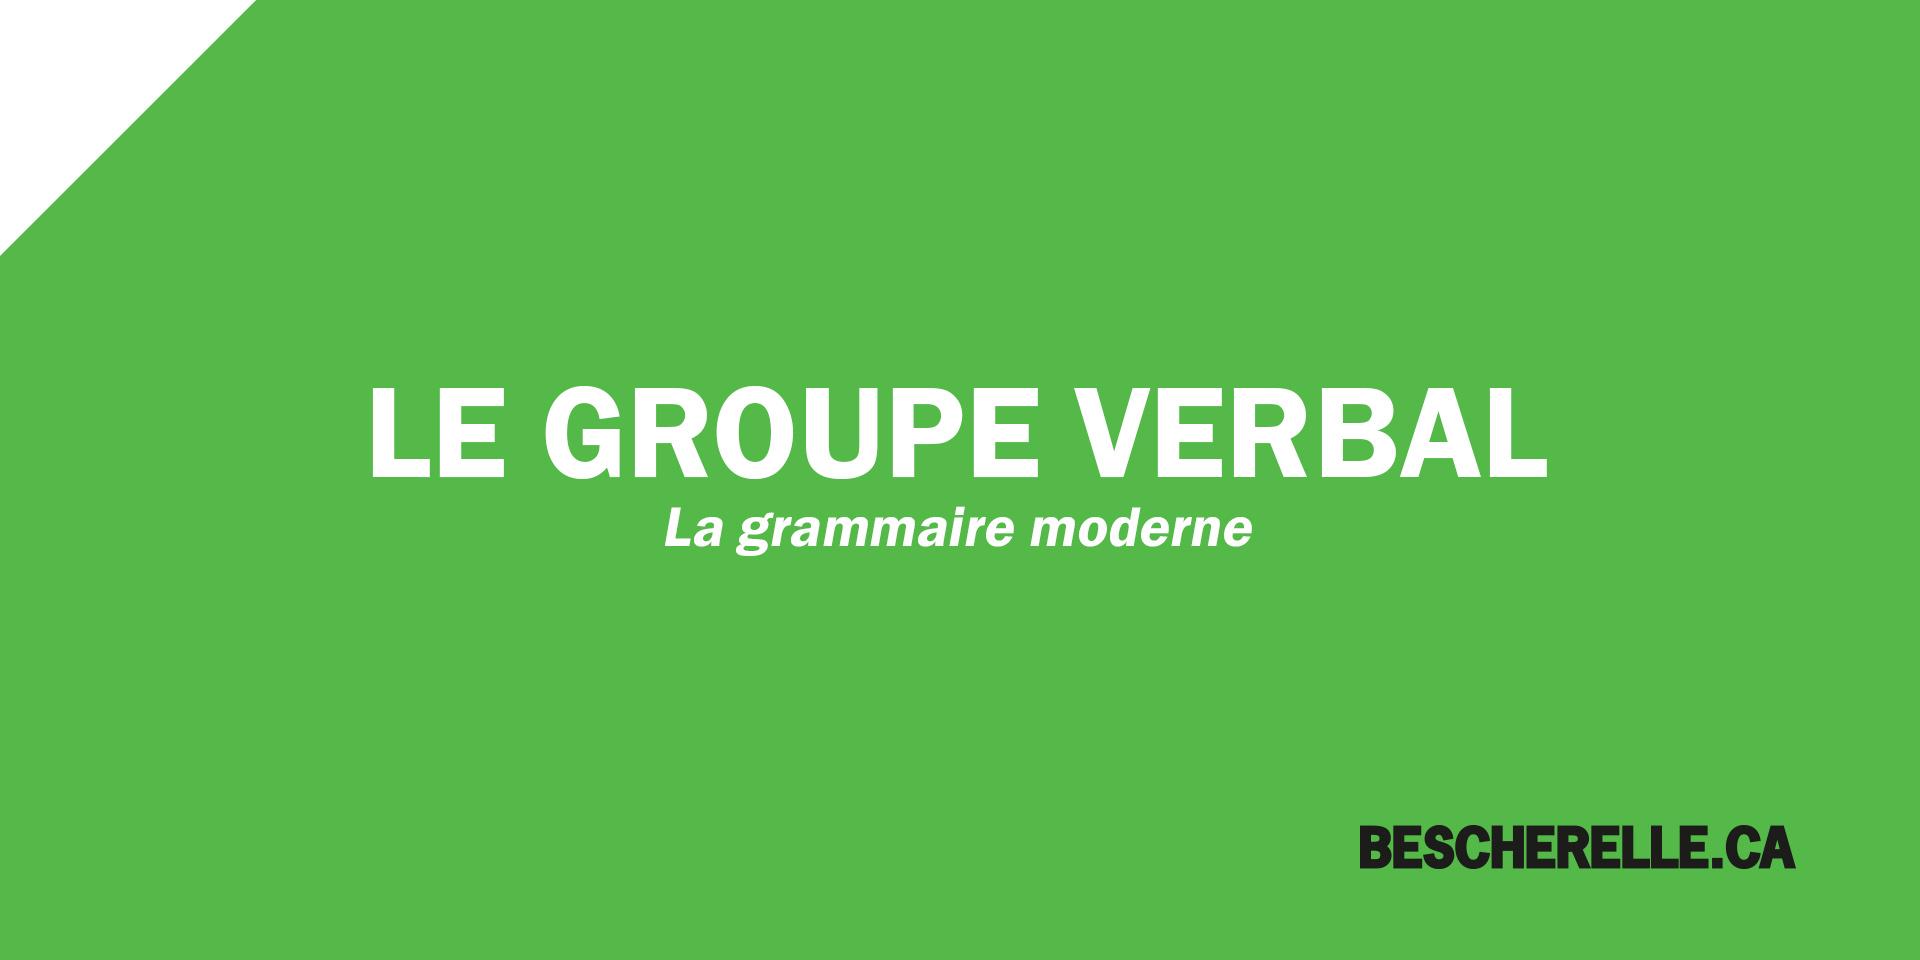 La Grammaire Moderne Bescherelle